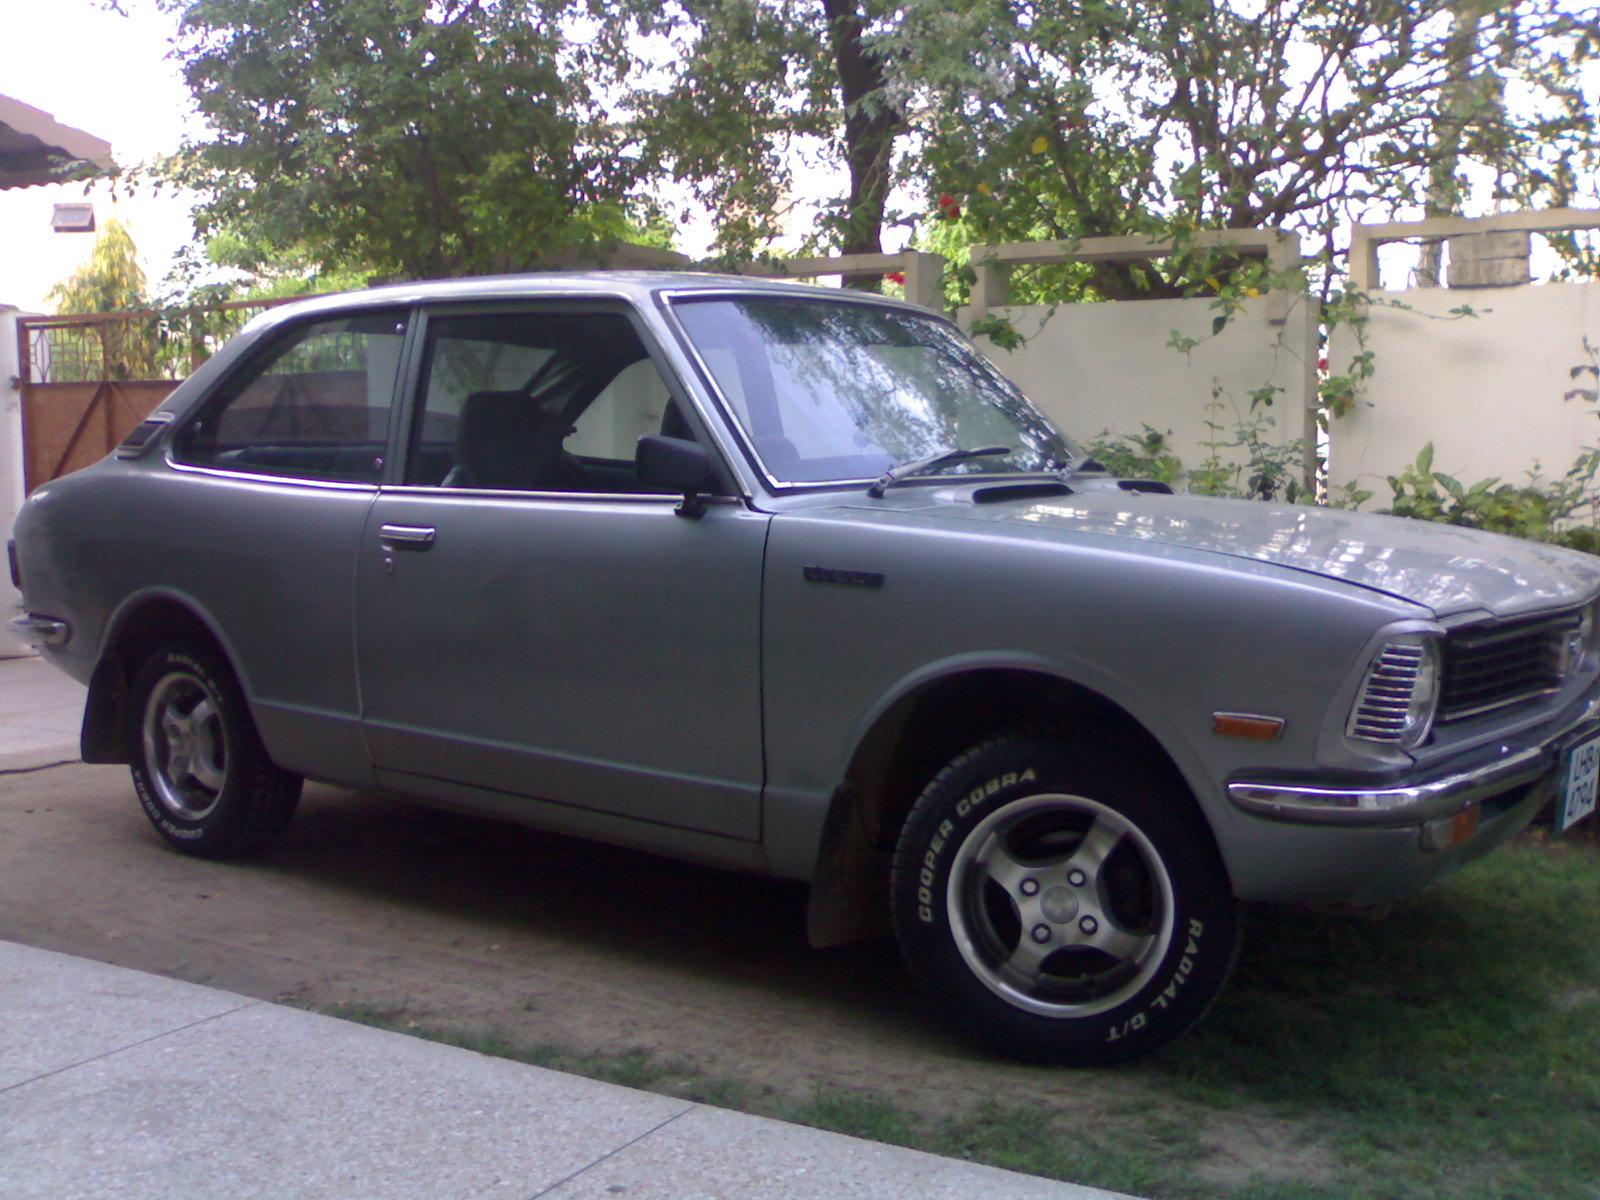 toyota corolla 1974 of shonas   member ride 15904 pakwheels